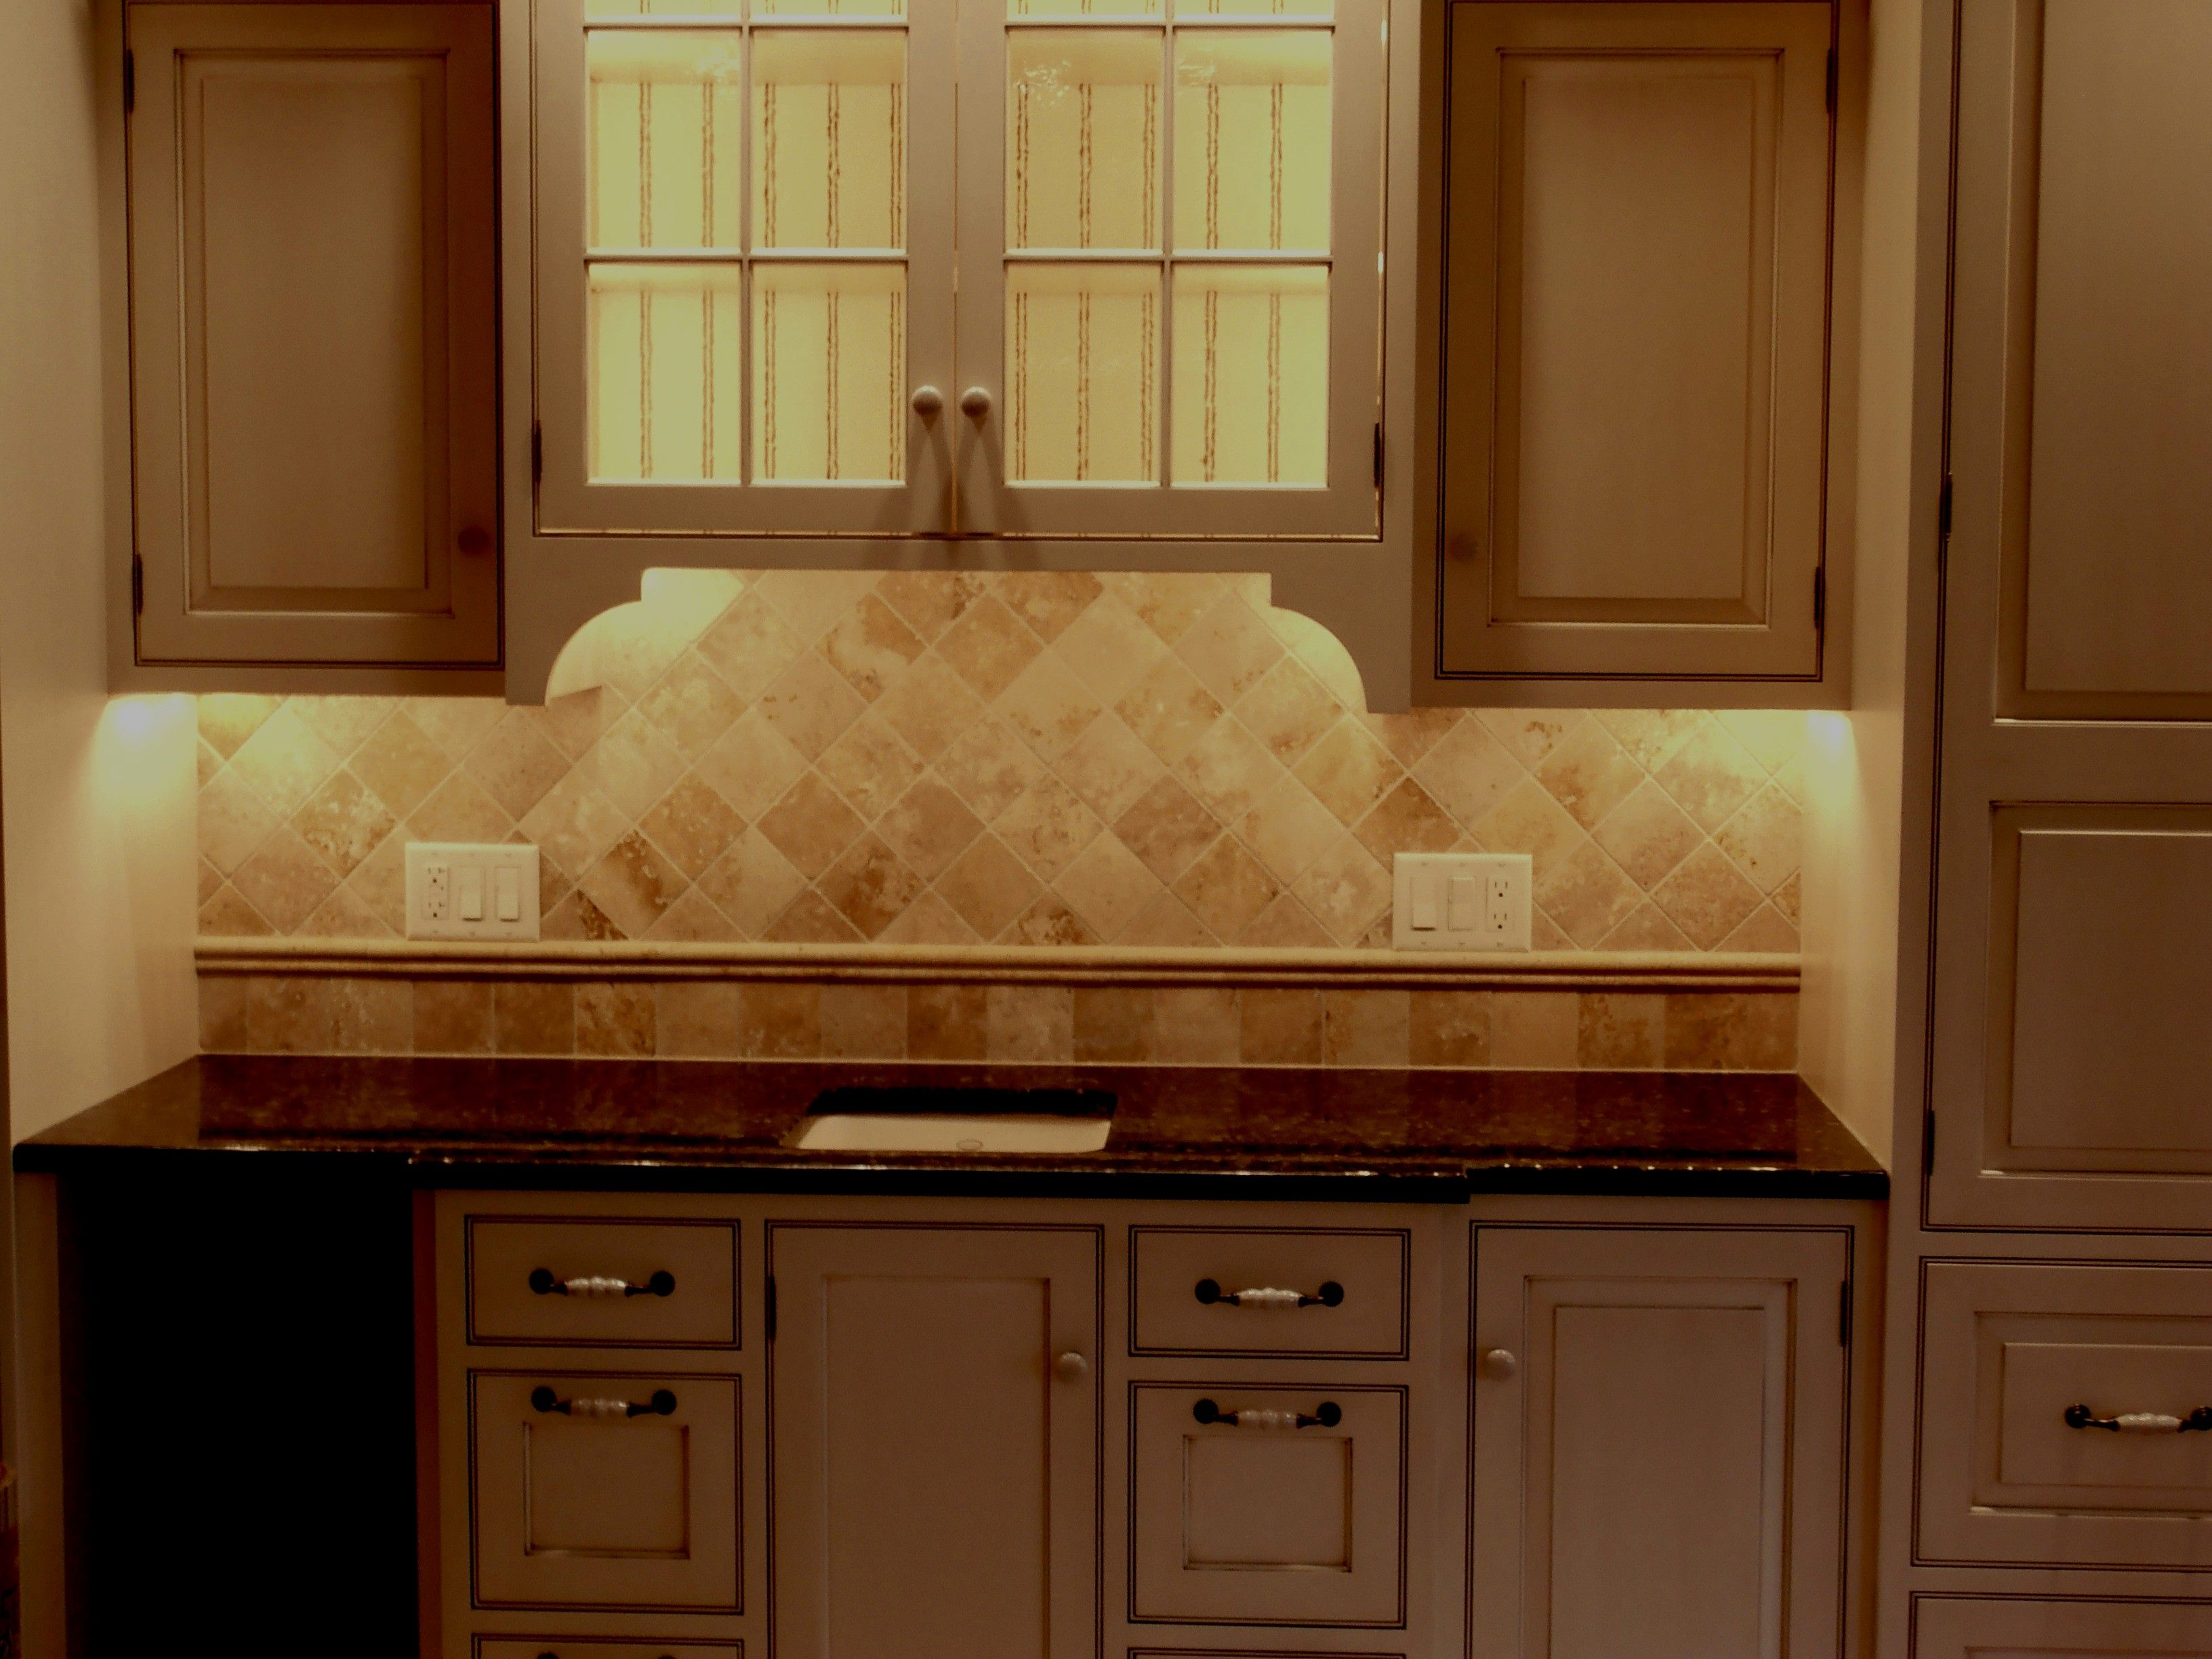 Tile Ideatravertine Tile For Backsplash In Kitchen Fresh Travertine